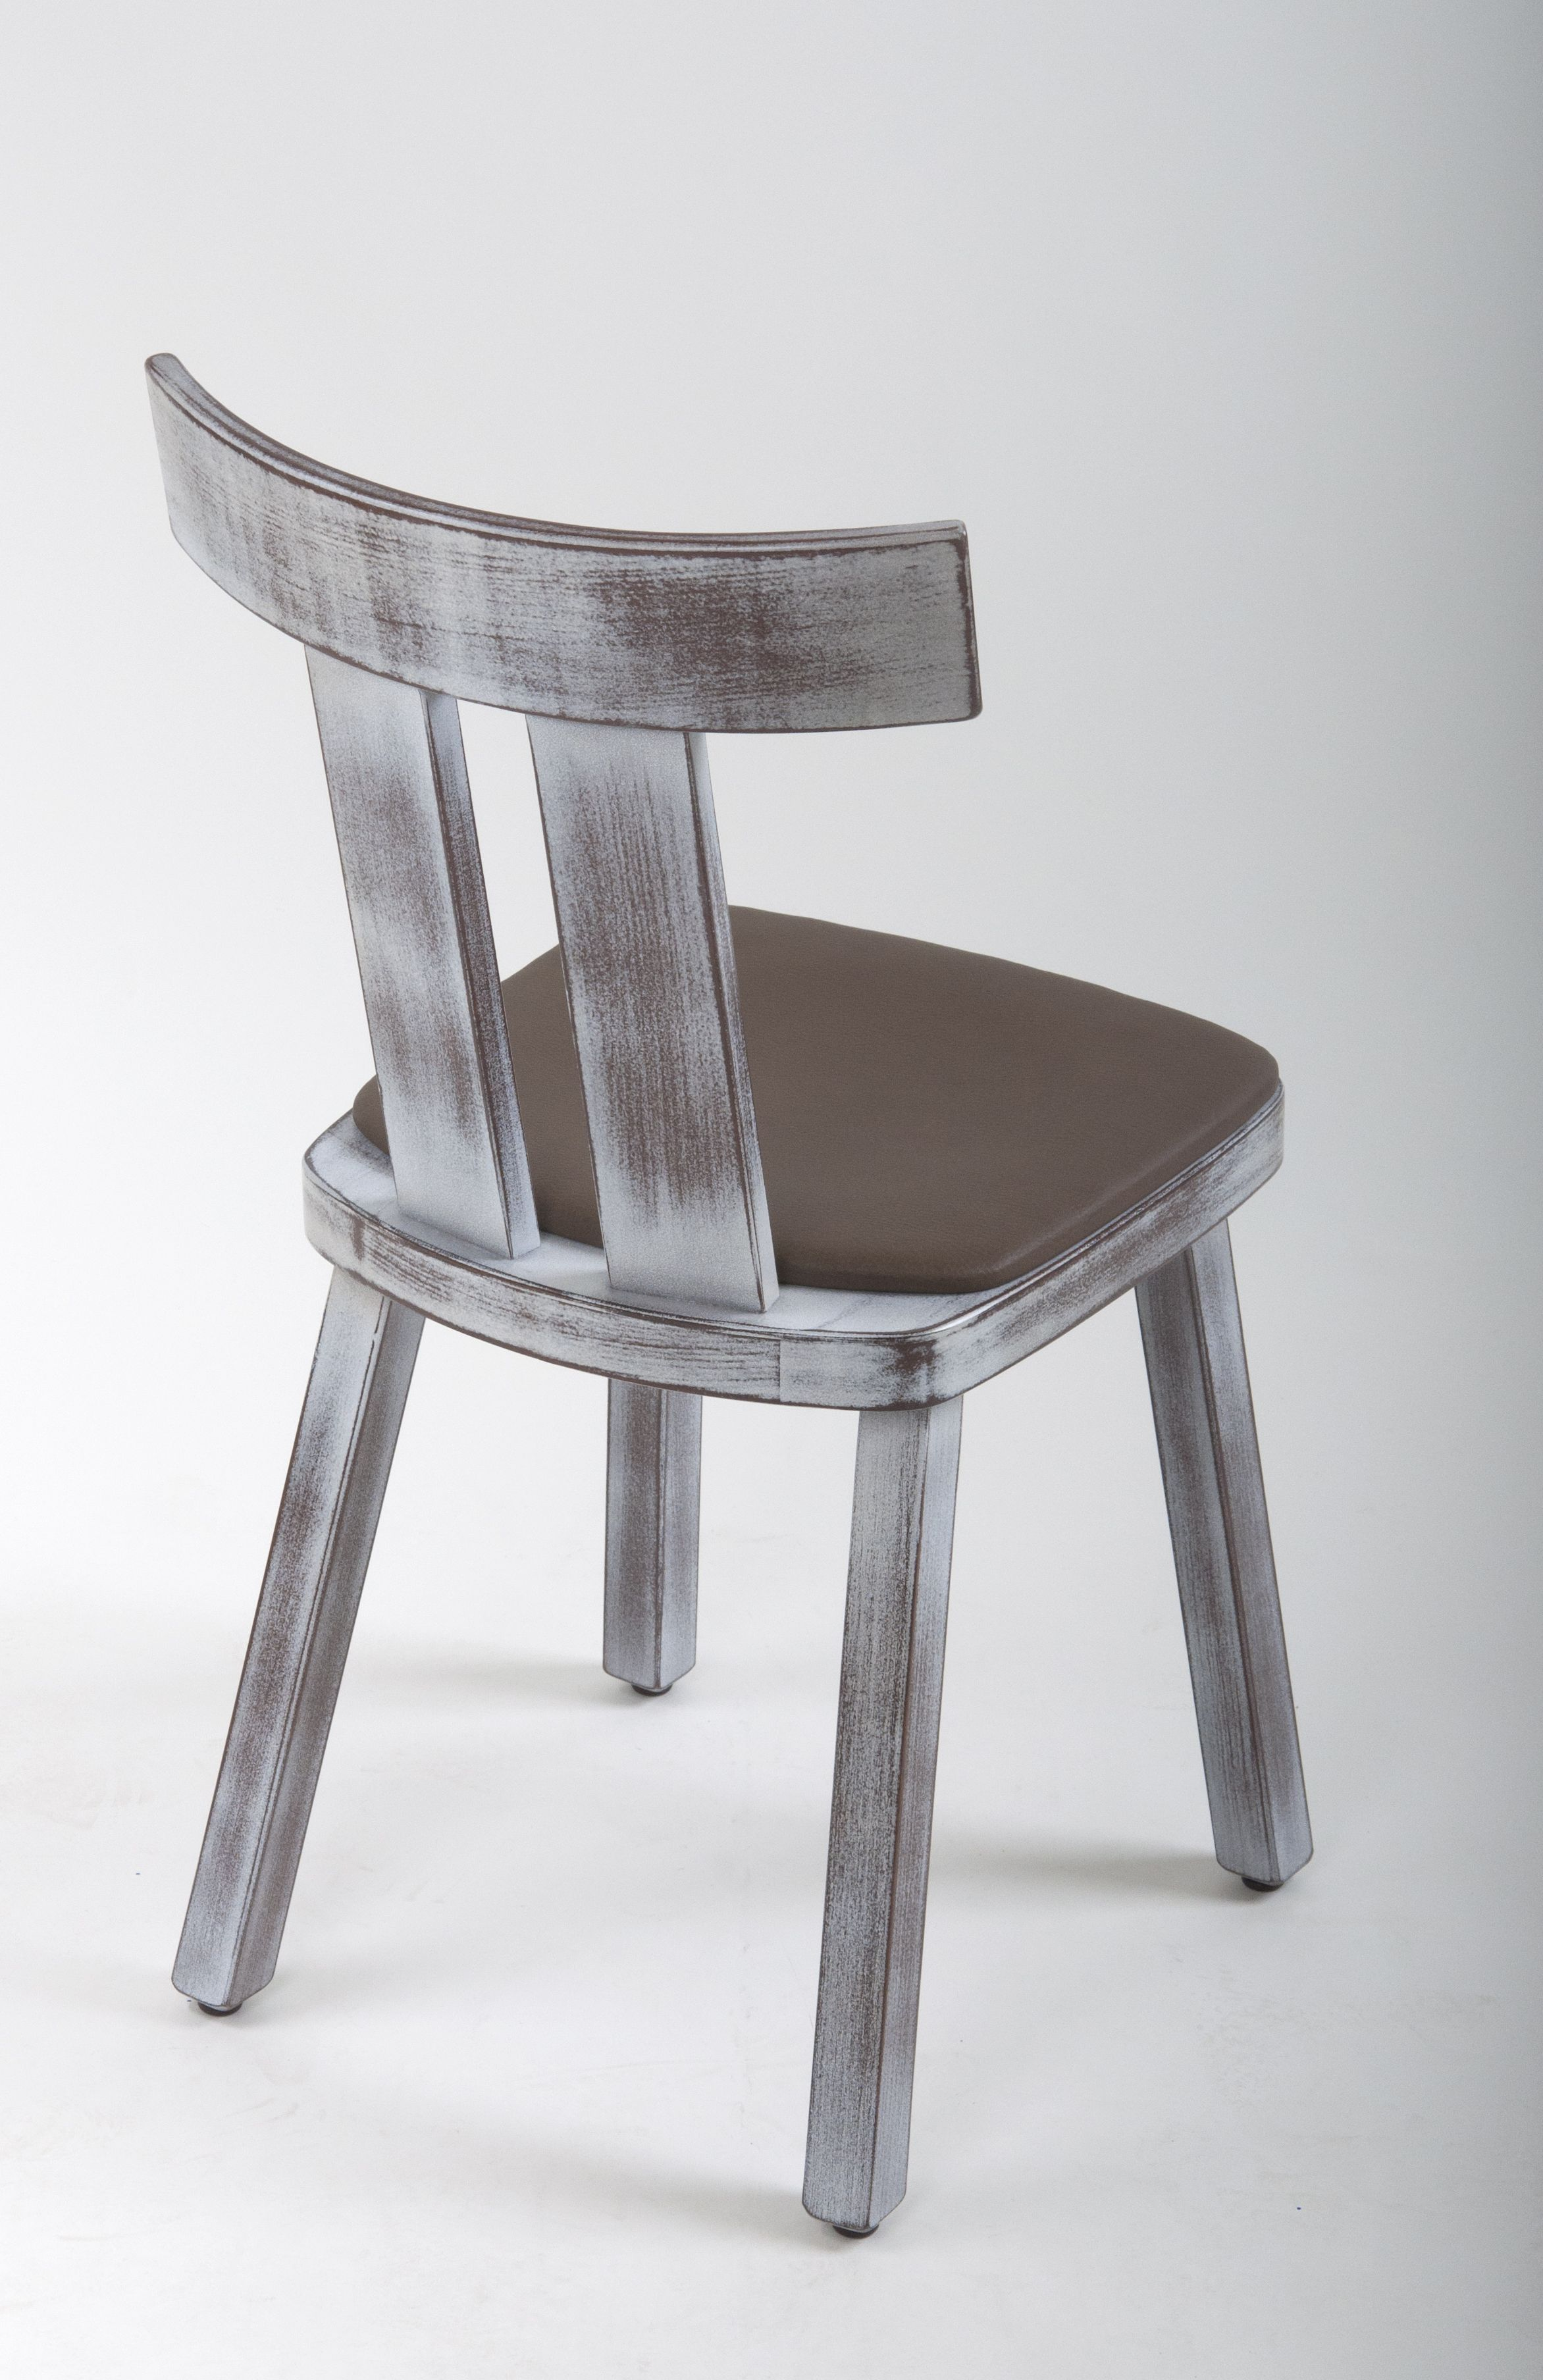 Gastro Sessel Gebraucht Gastronomie Bestuhlung Mbel Beautiful Full